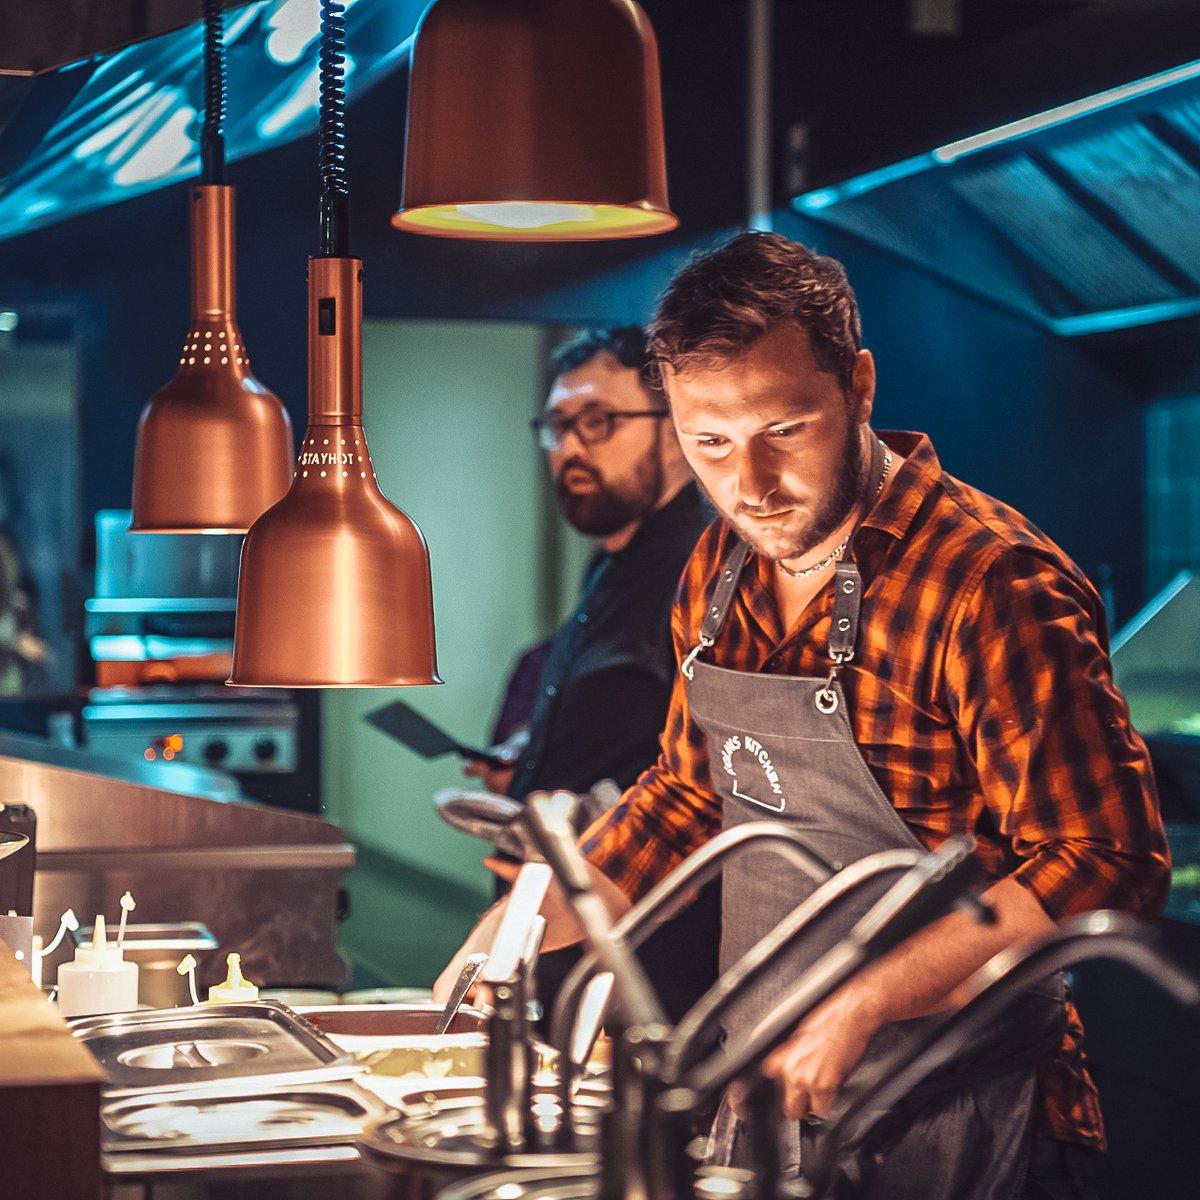 Kolins Kitchen Foodstand